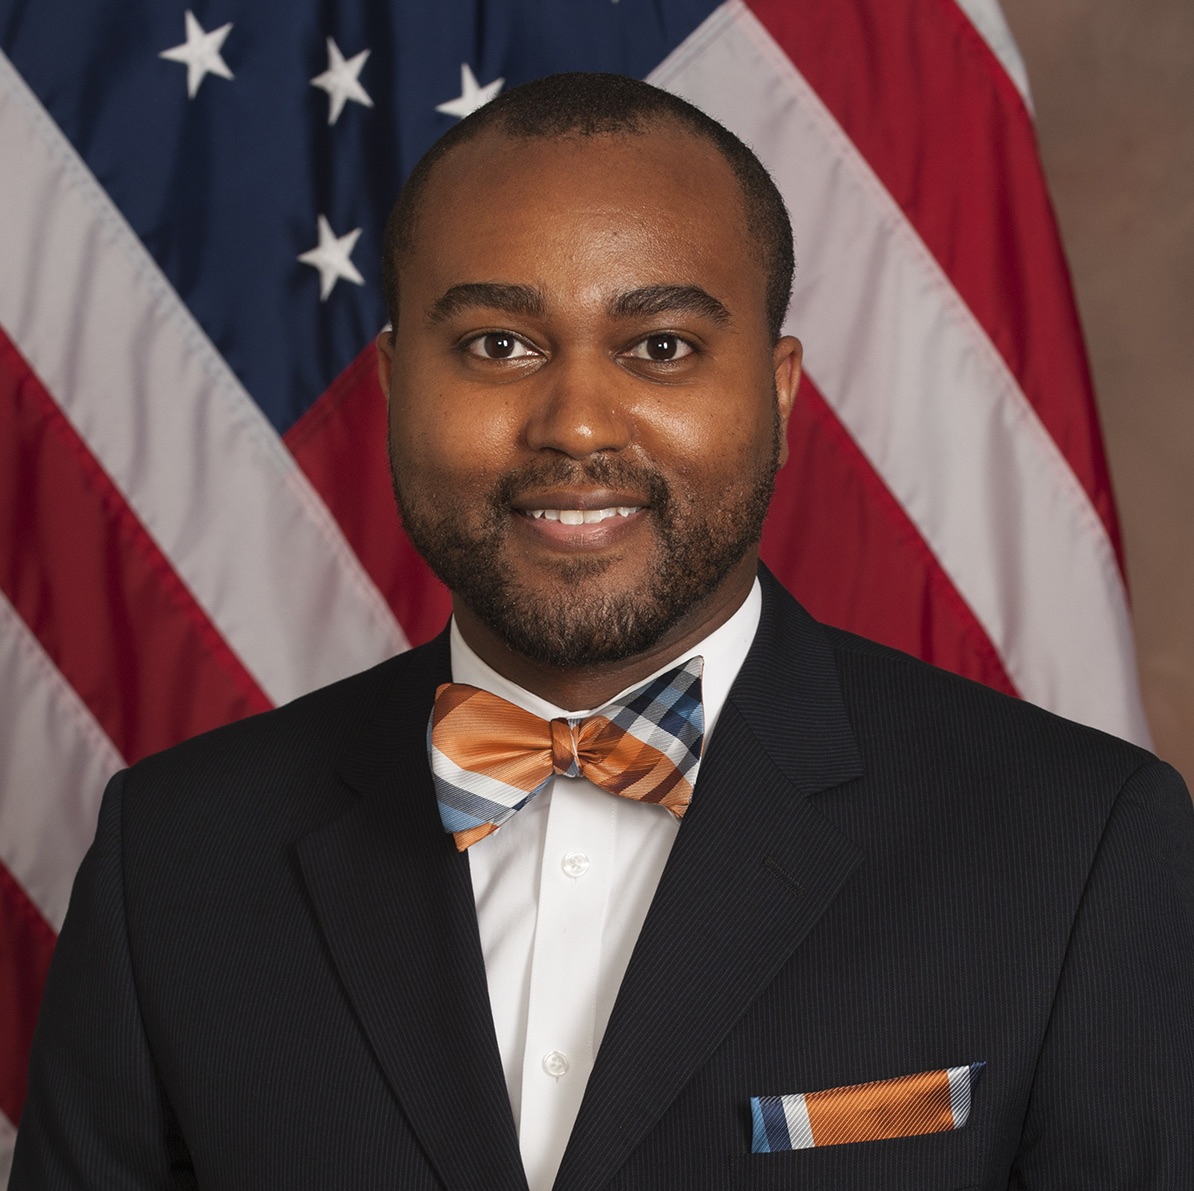 Samuel J. Ivy